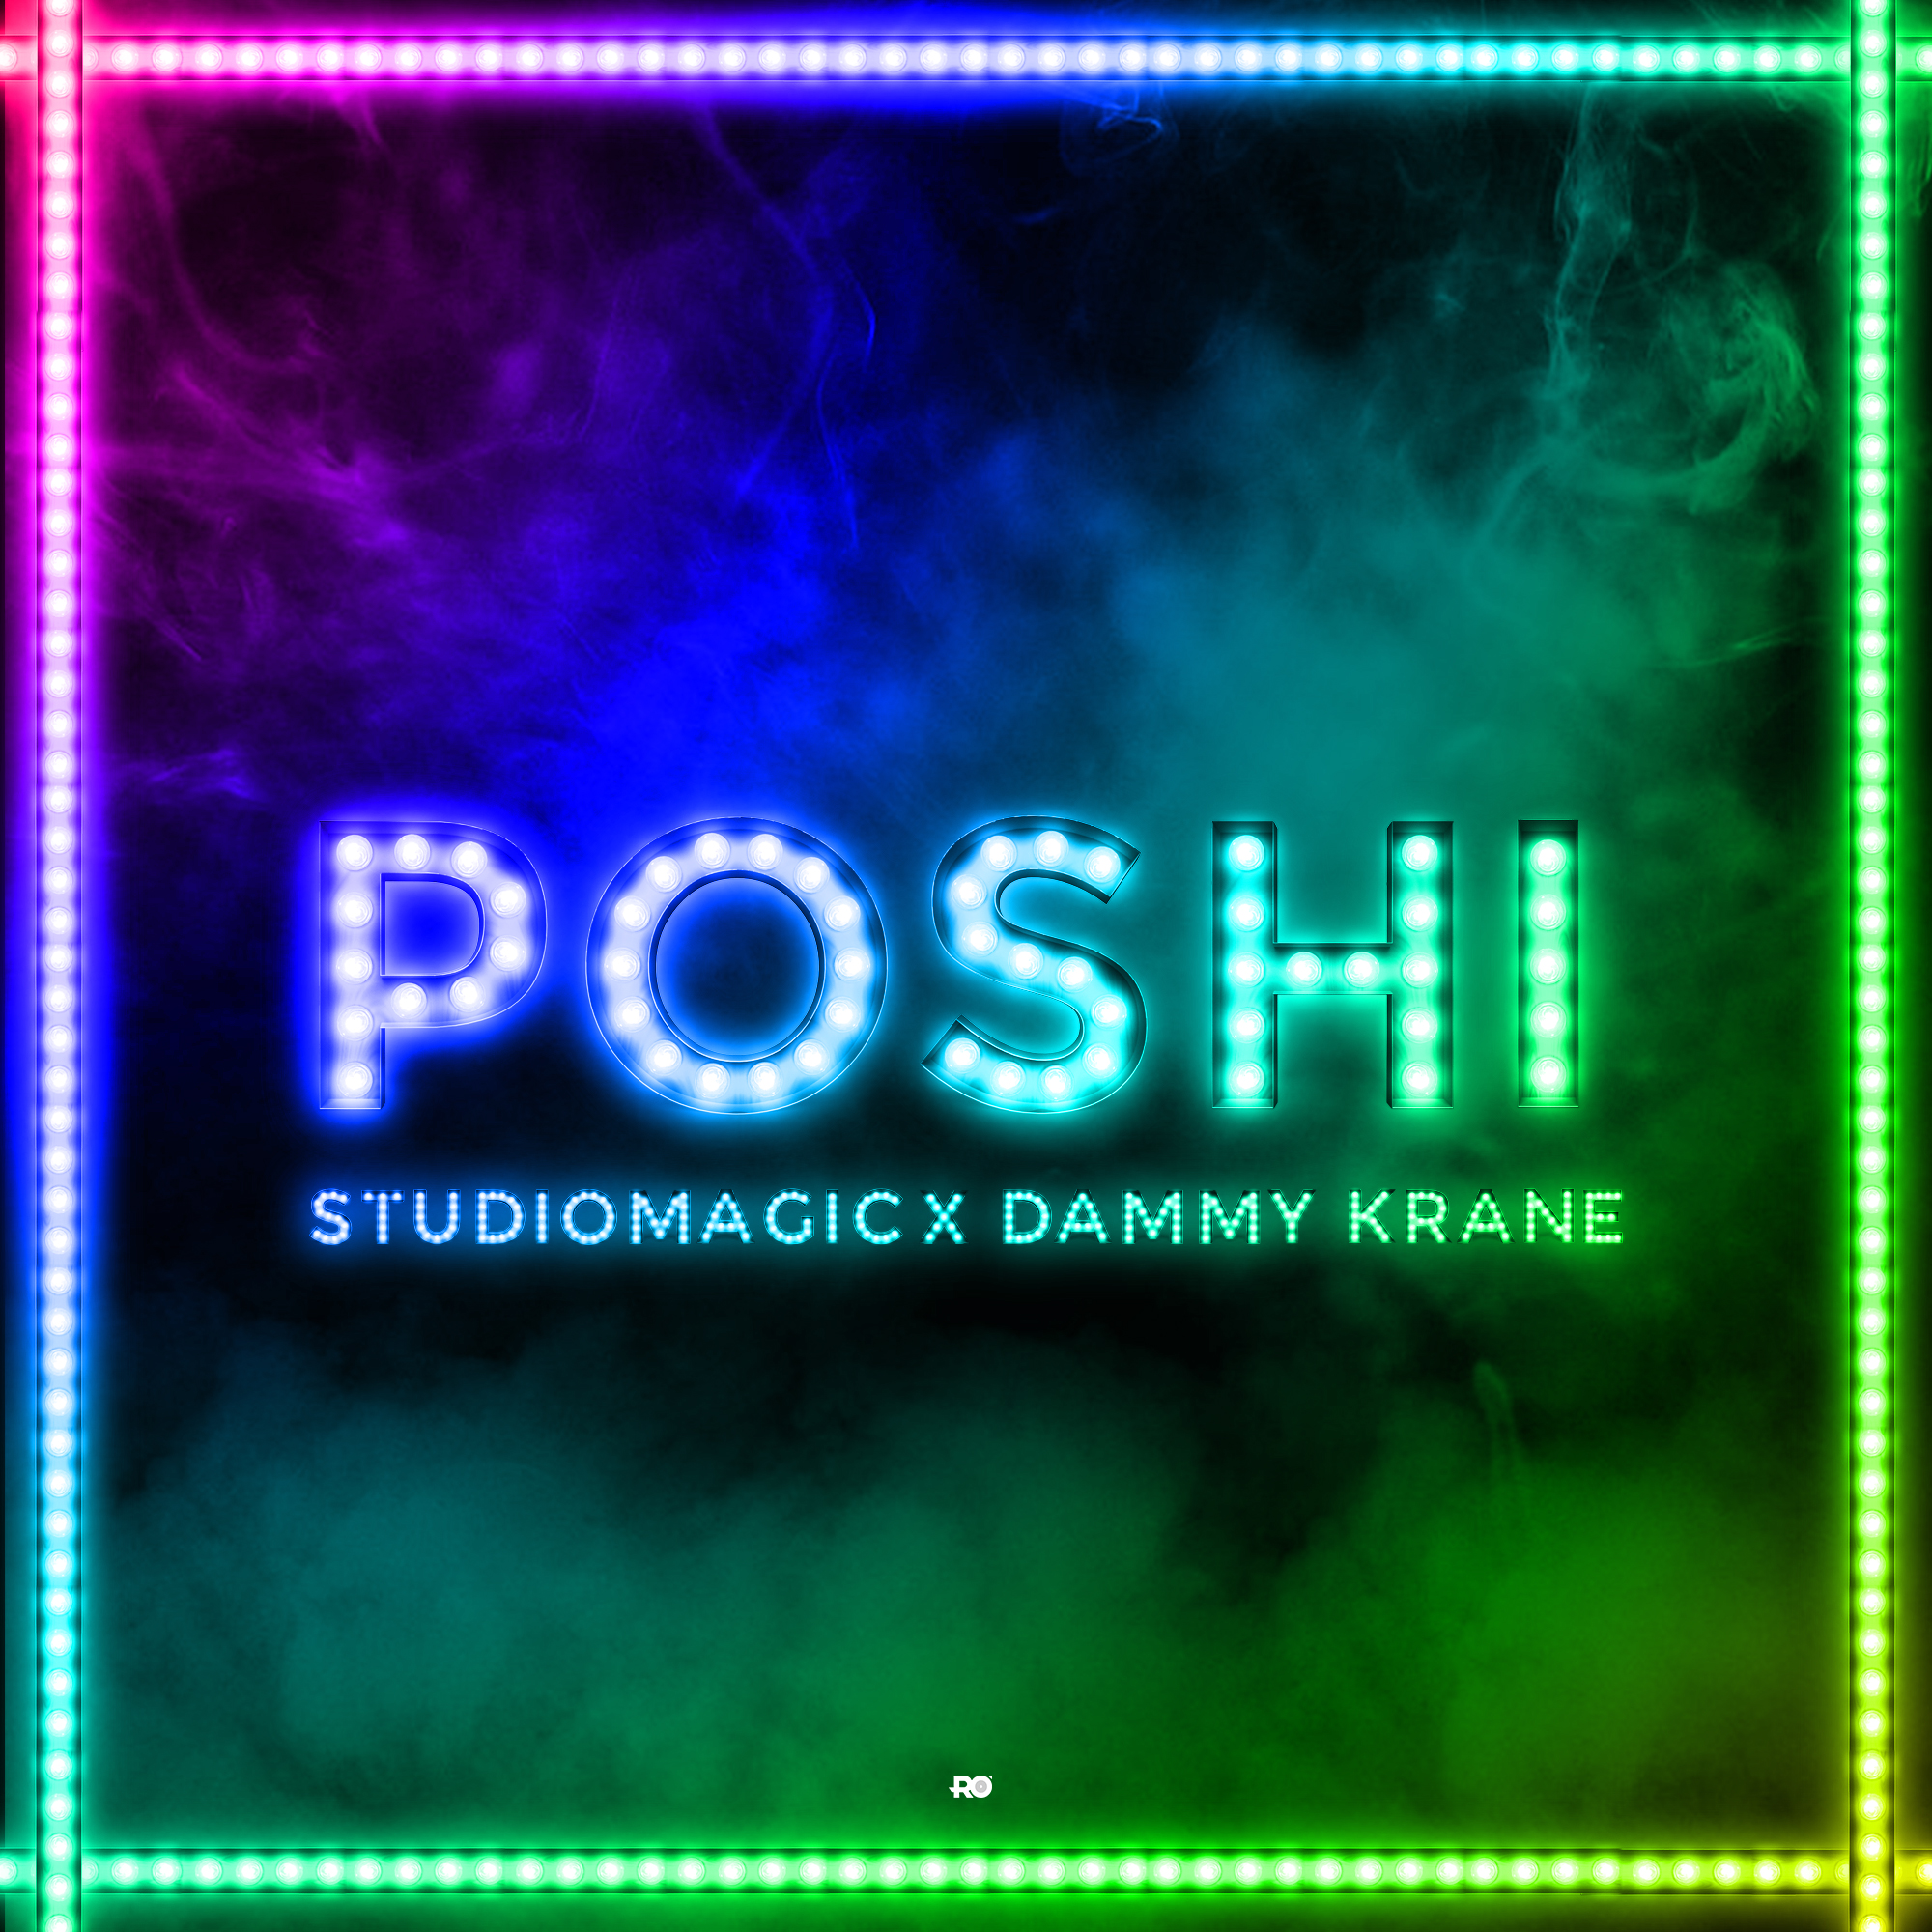 Studio Magic X Dammy Krane - Poshi | Freestyle Competition To Win £500